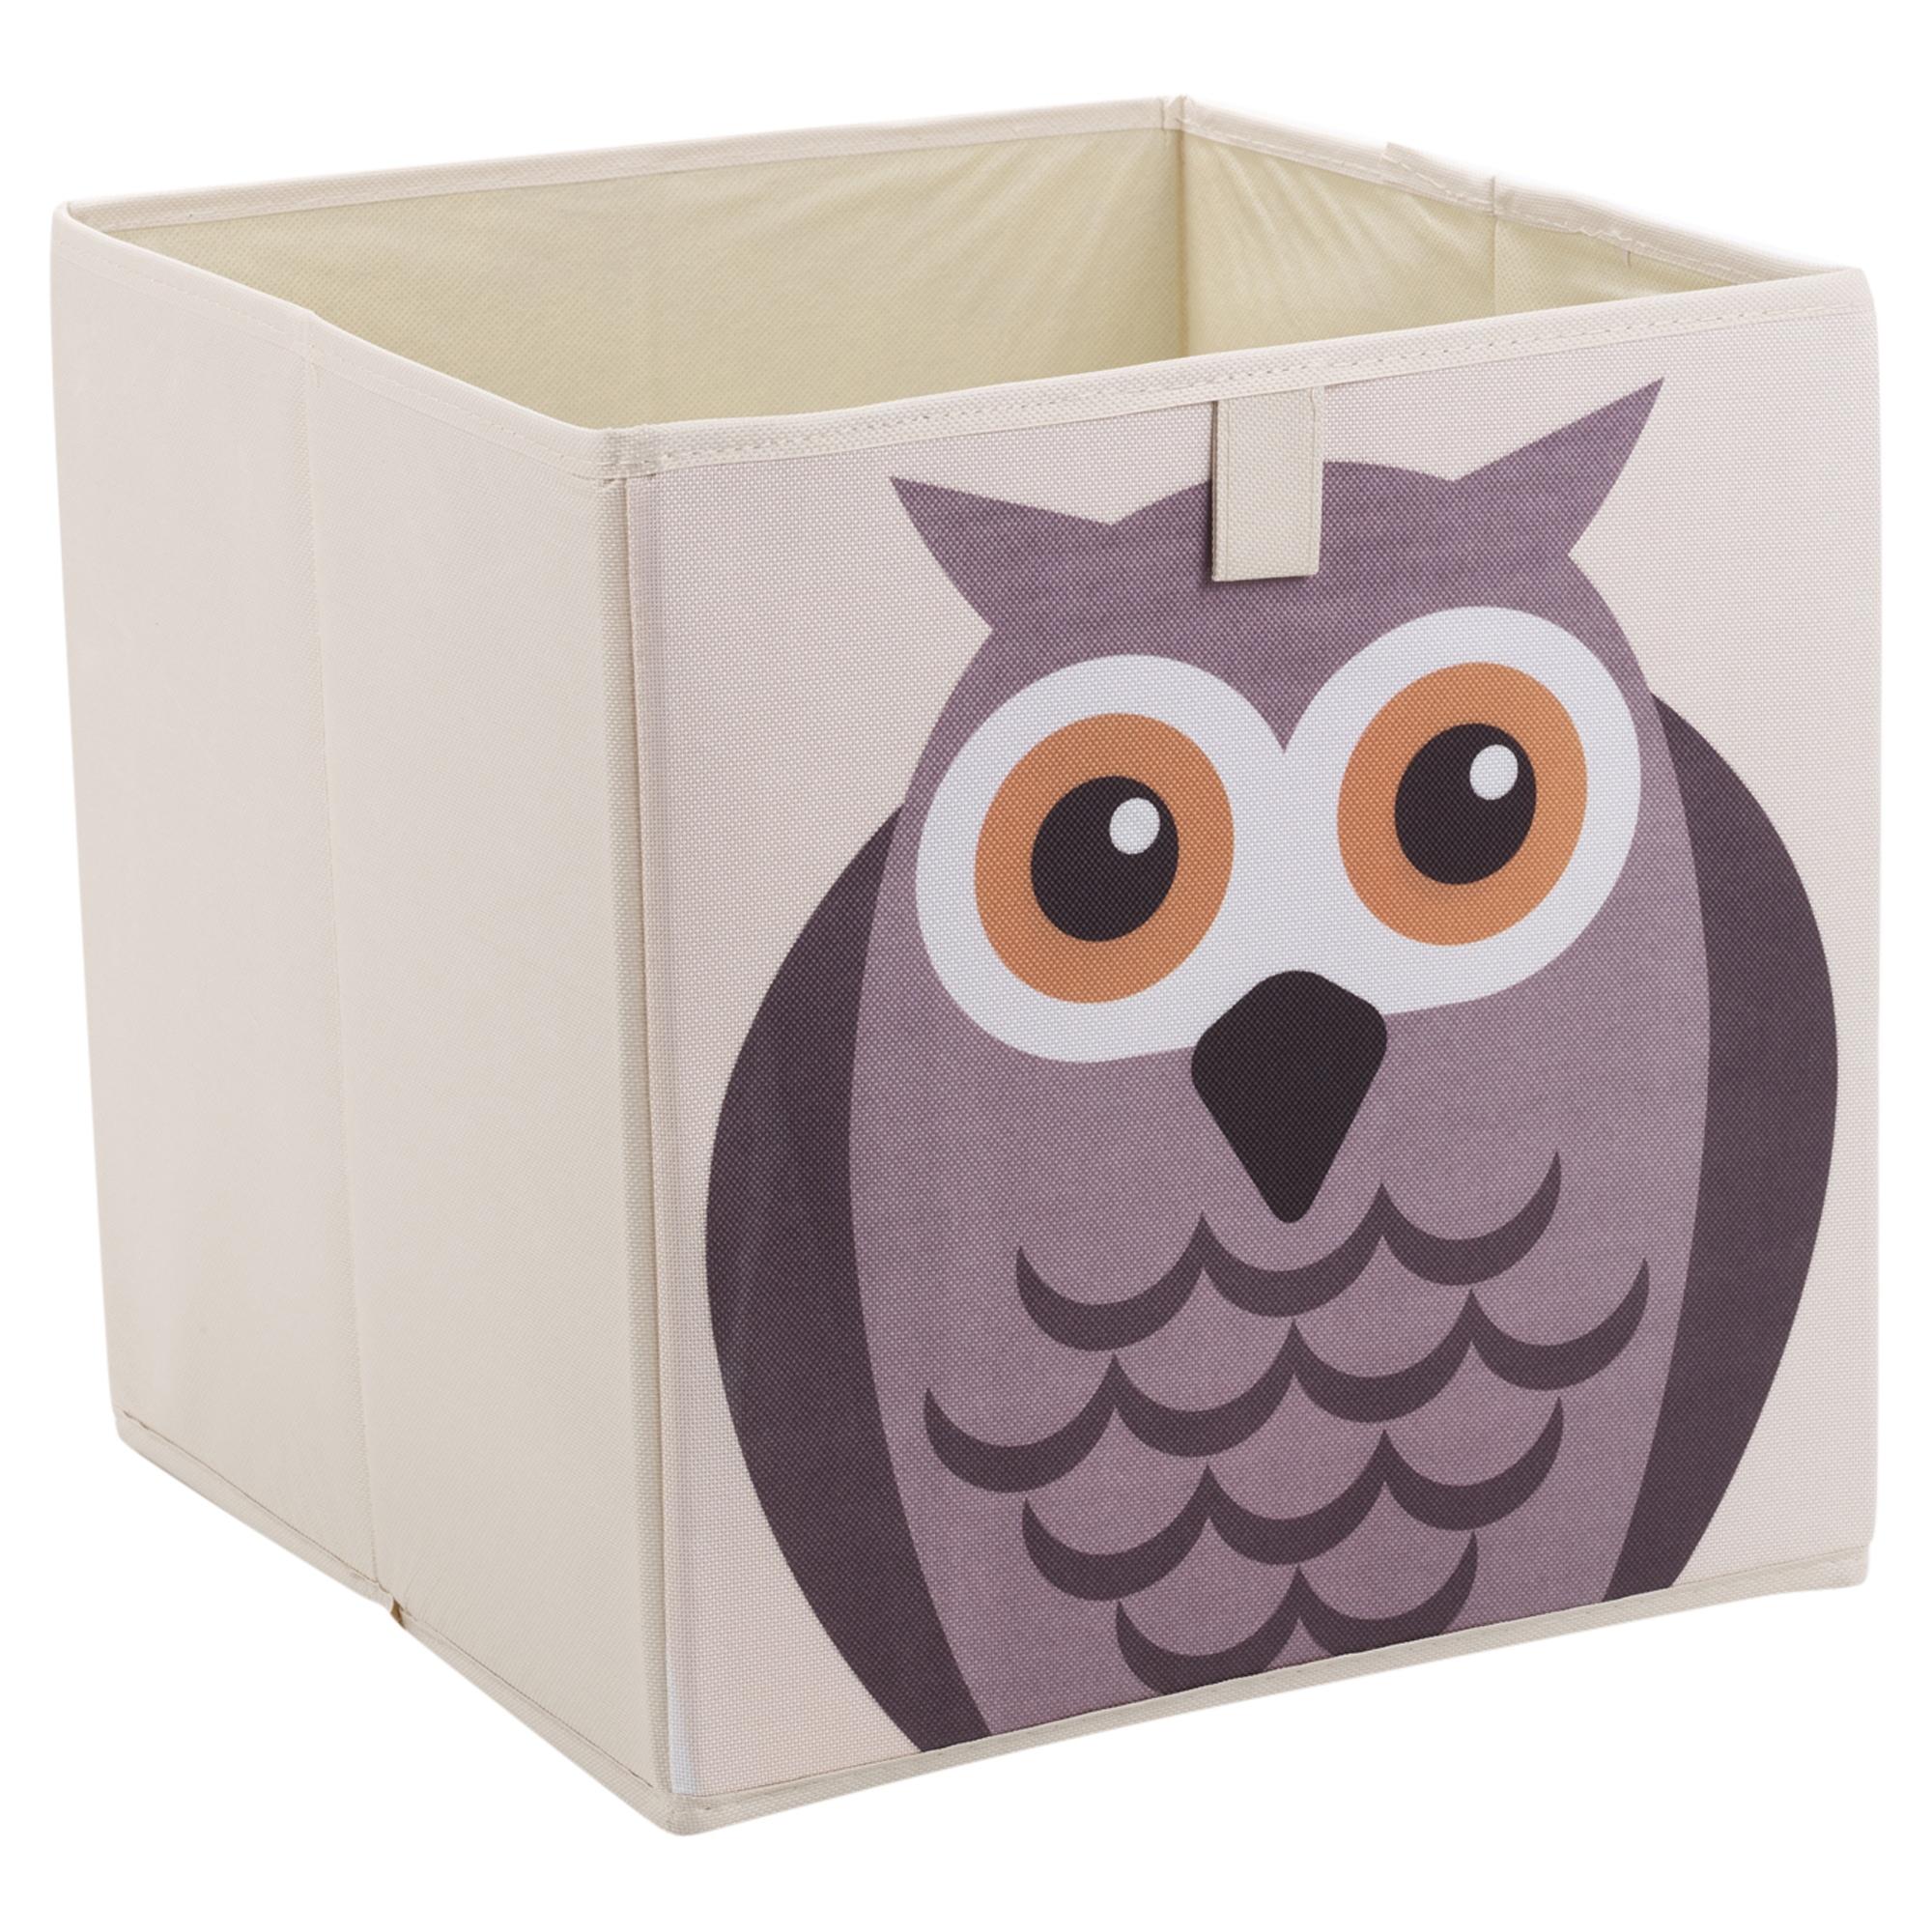 Square Collapsible Canvas Storage Box Foldable Kids Toys: Kids Toy Animal Storage Box Collapsible Non Woven Fabric